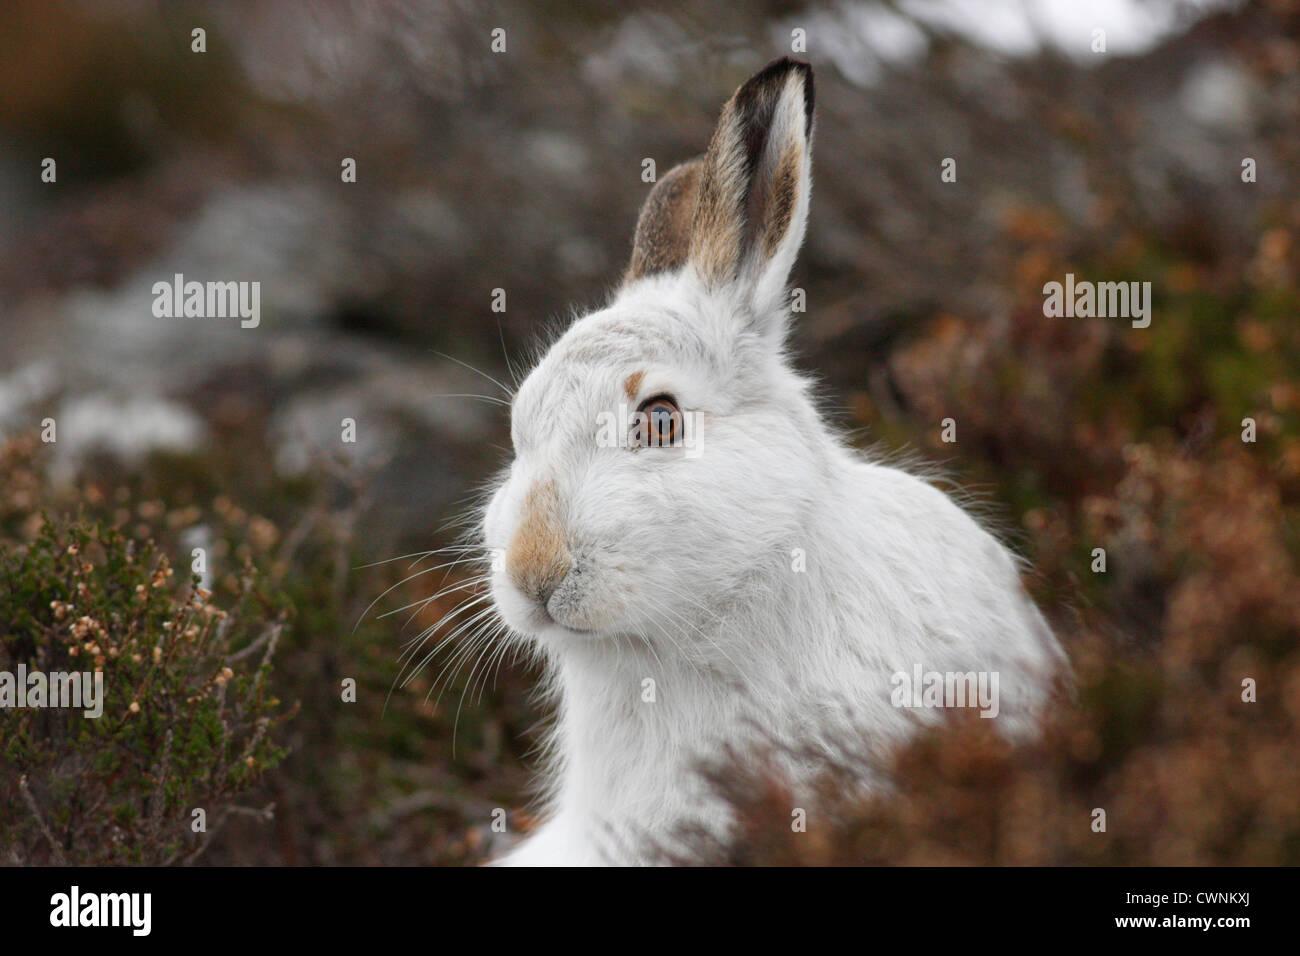 Mountain Hare (Lepus timidus) in white winter pelage, Highlands, Scotland, UK - Stock Image